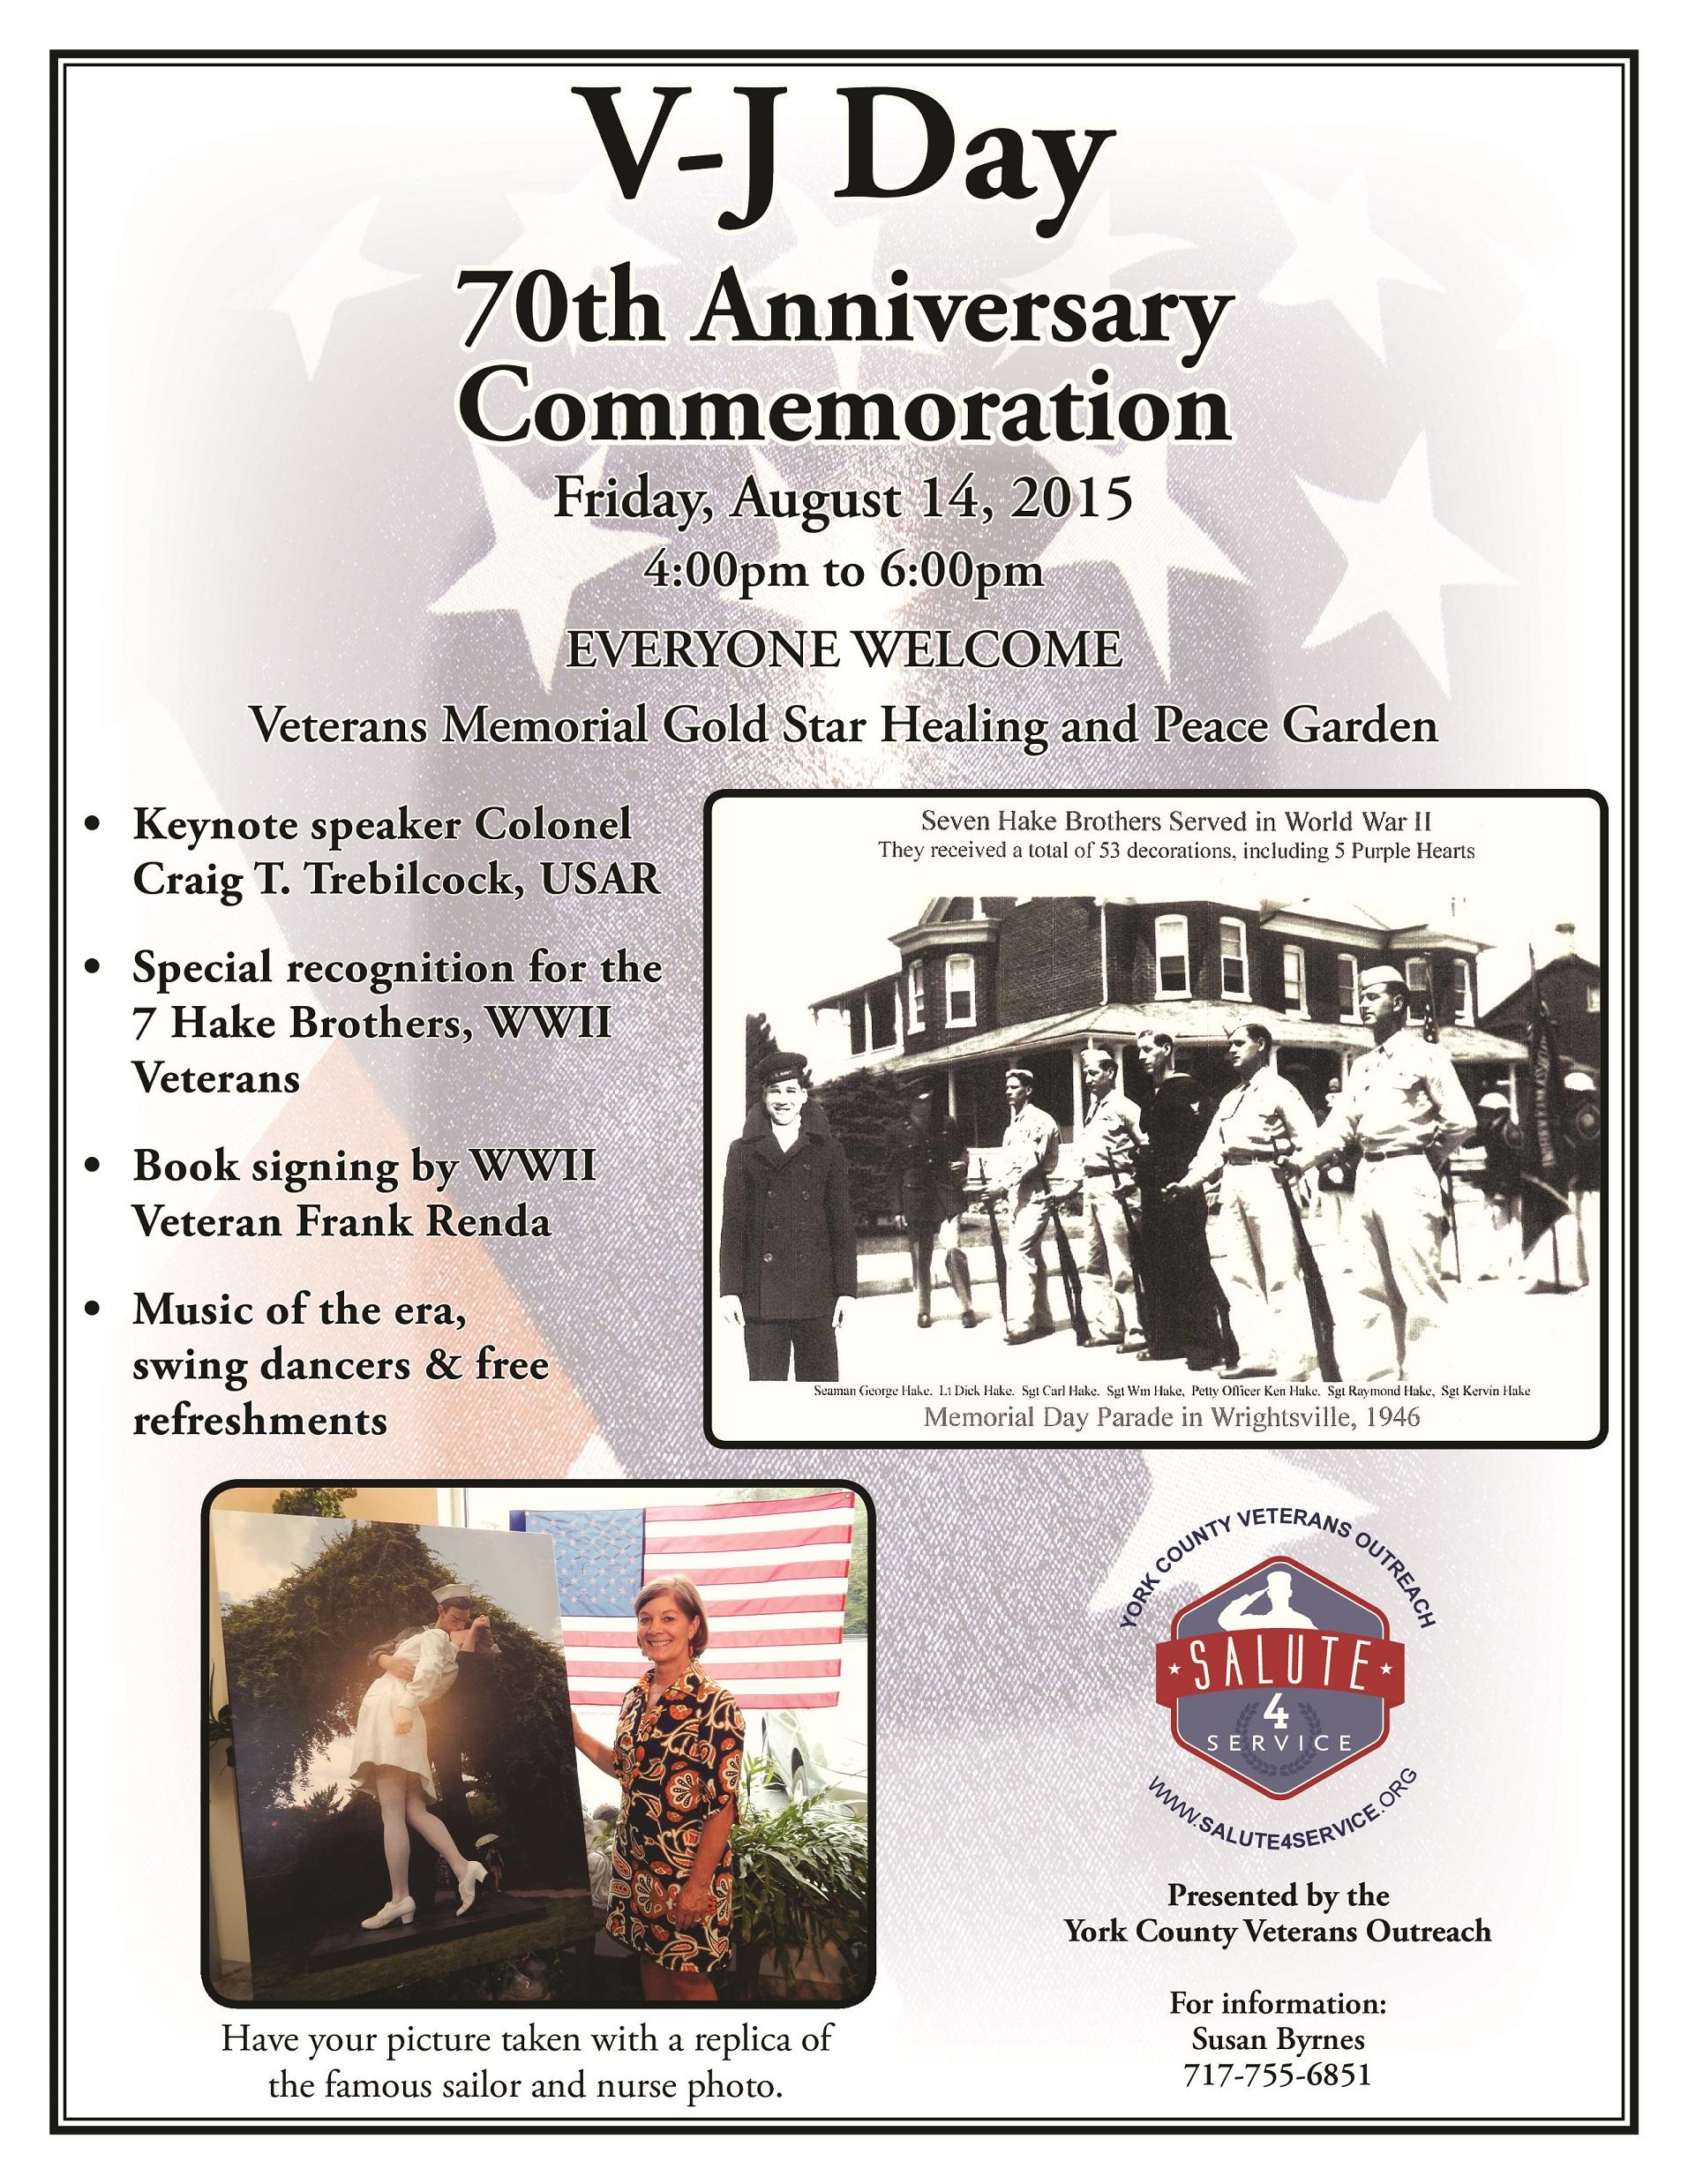 VJ Day 70th Anniversary